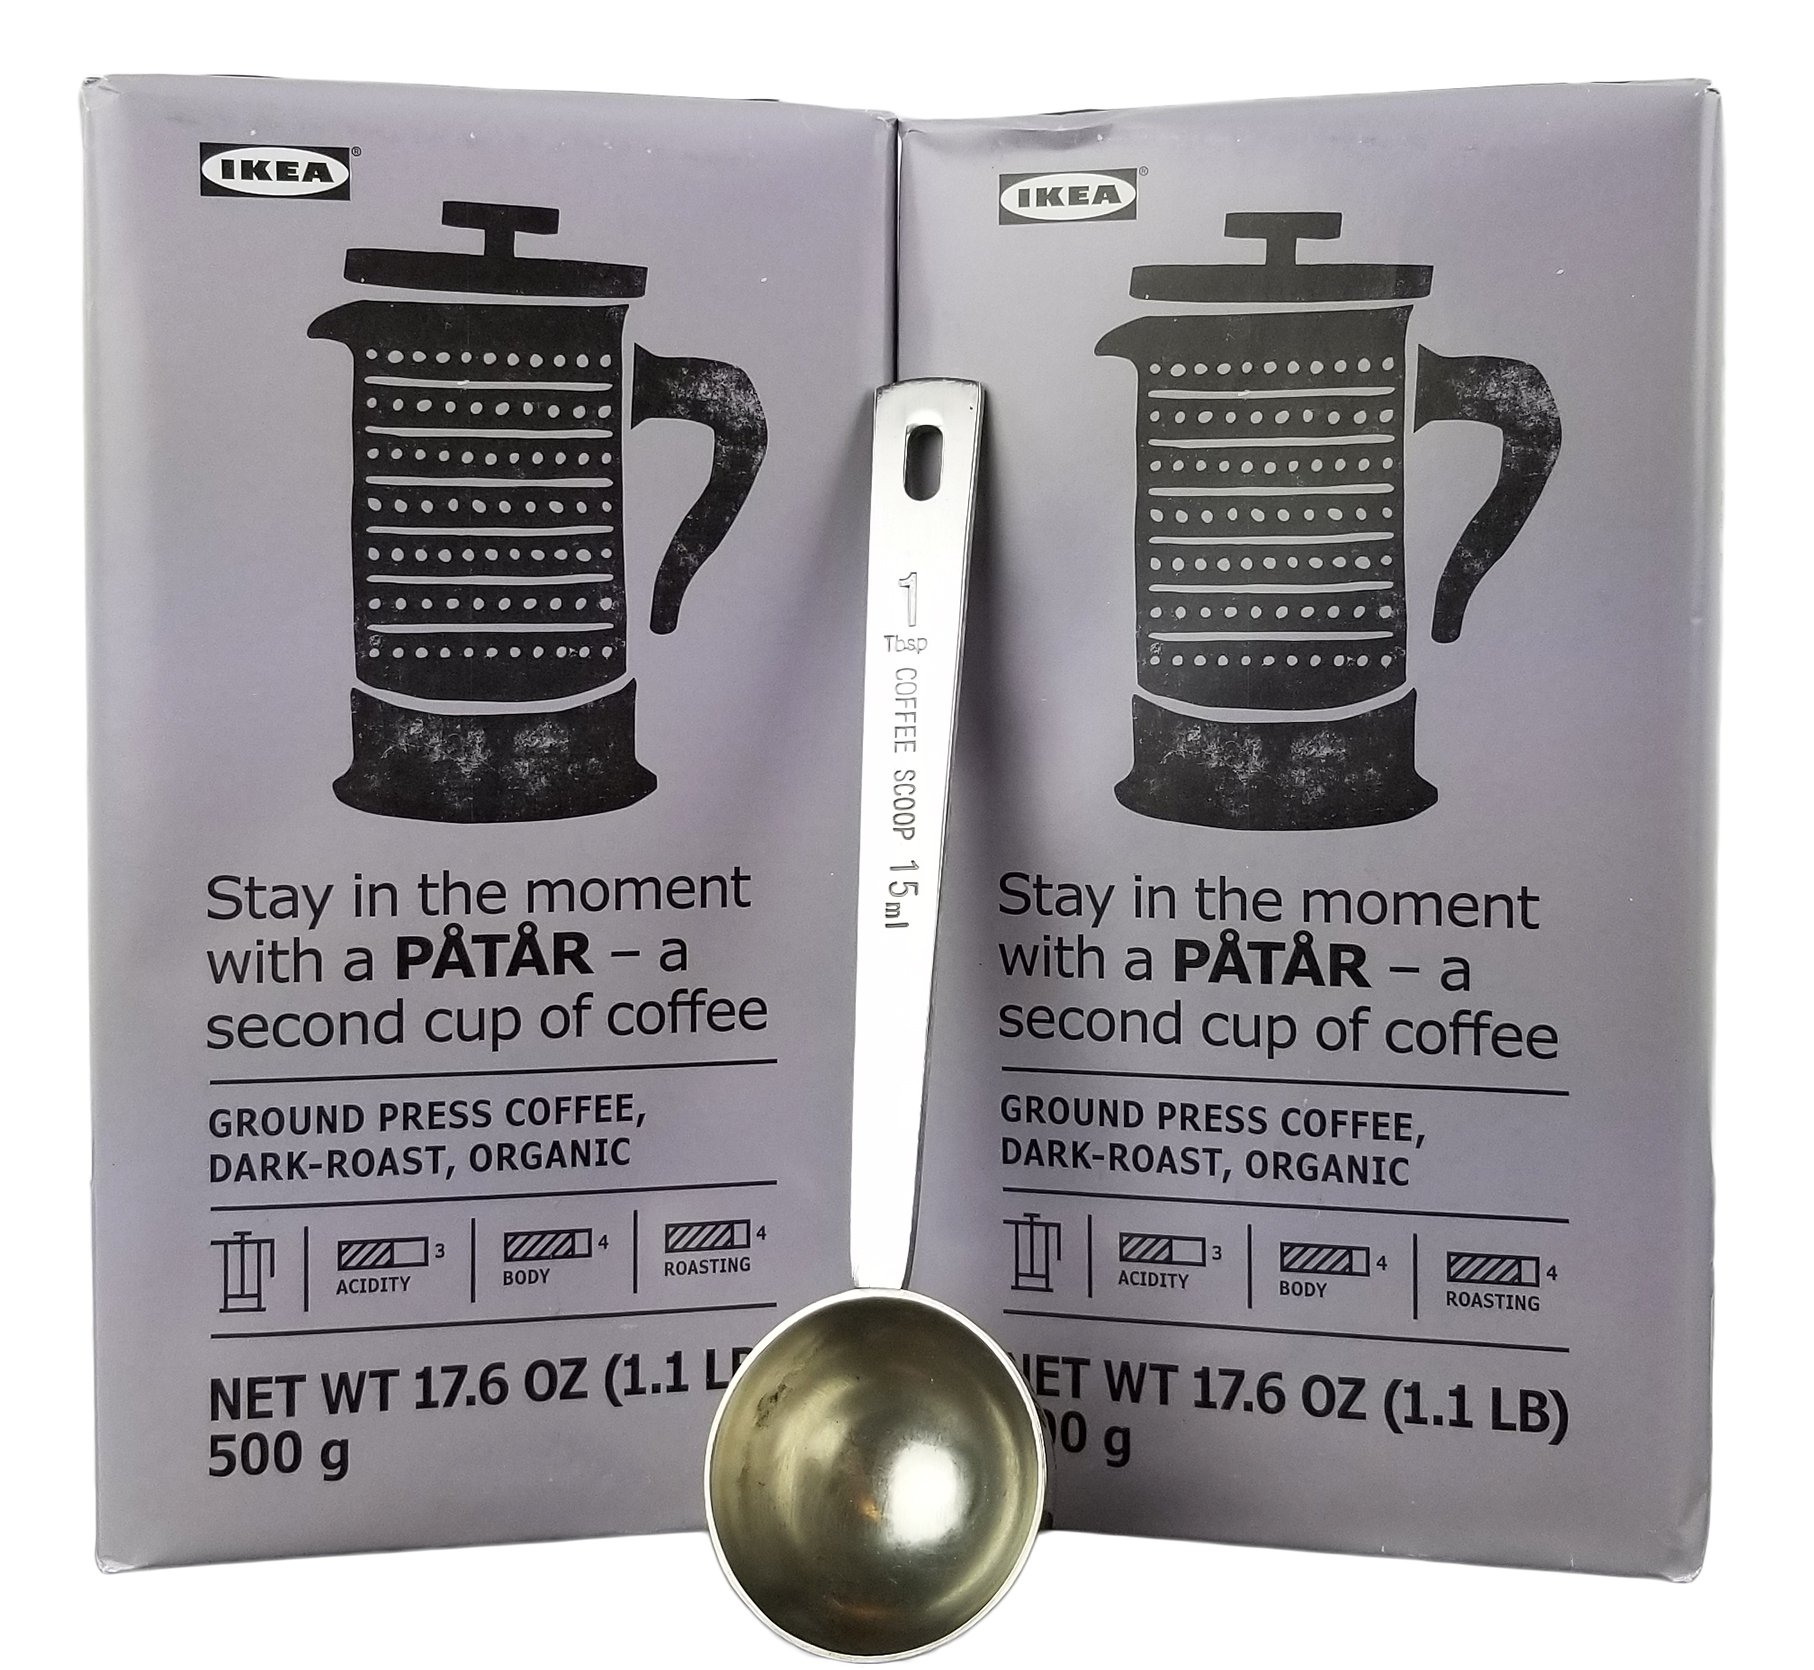 IKEA FINE Ground Press Coffee, Dark Roast Bulk Bundle - 100% Organic Arabica Coffee - 17.6 Oz Each (Pack of 2 - Total 35.2 oz) With Stainless Steel Measuring Coffee Spoon Greek Turkish French Press